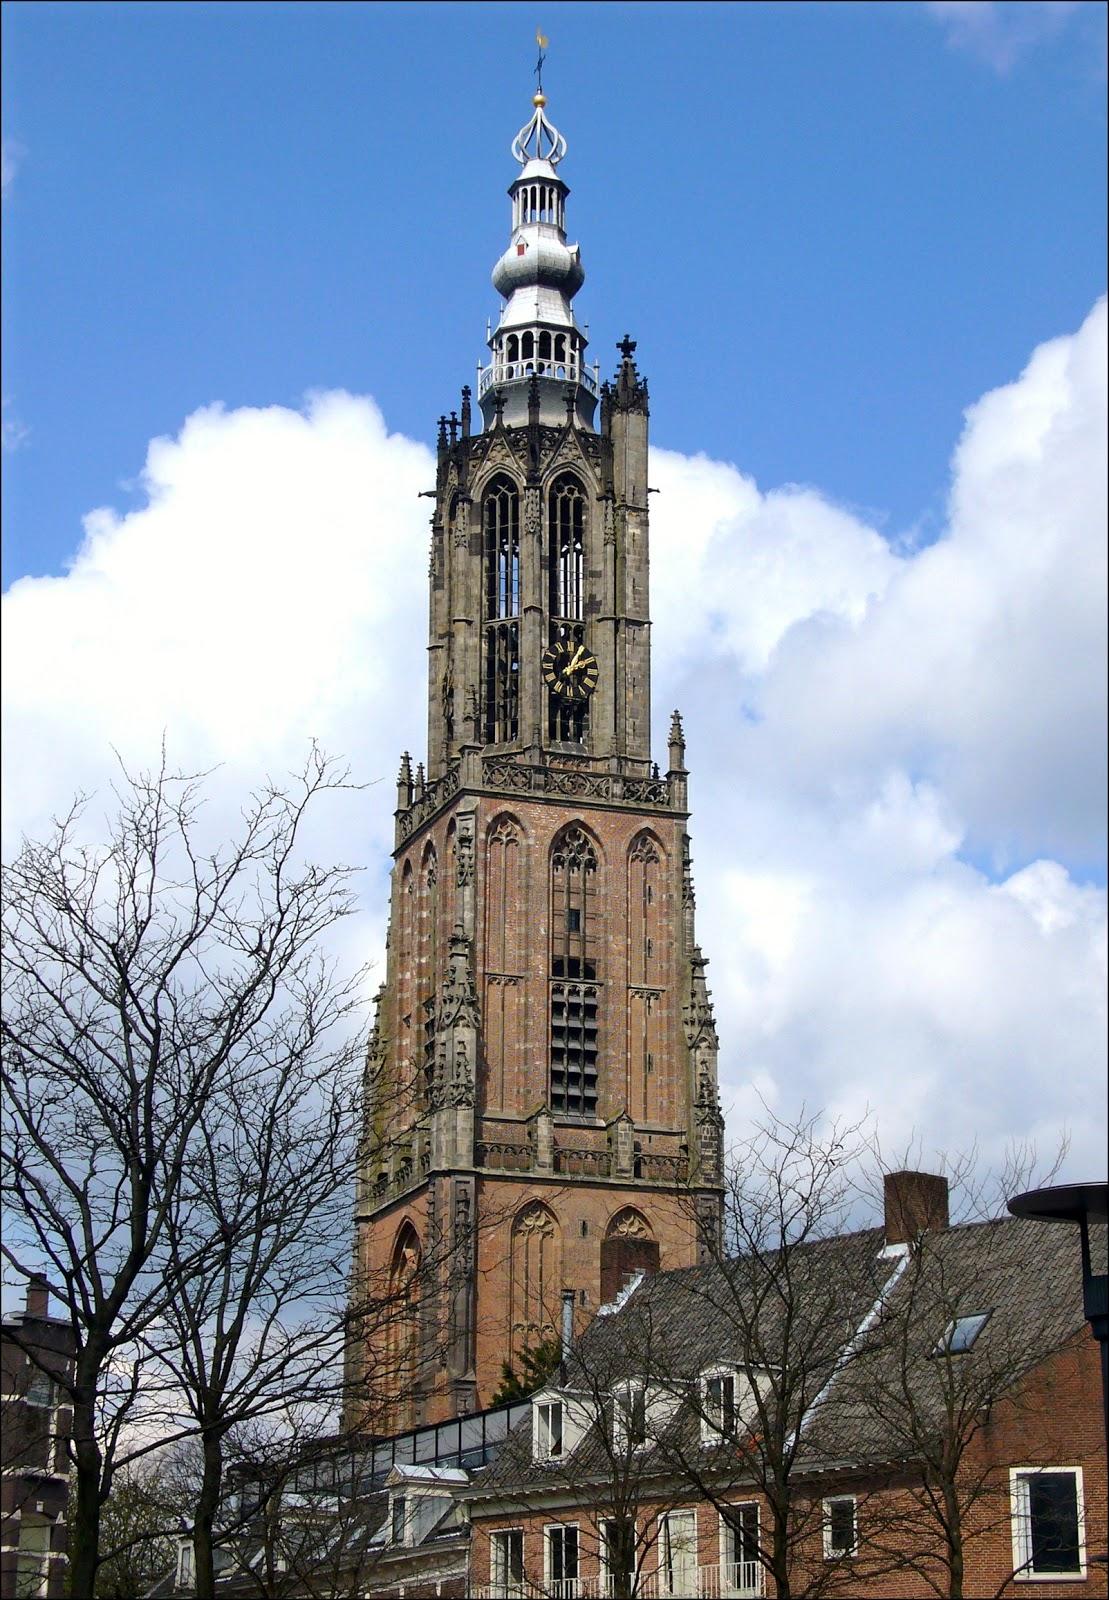 Photo by Pepijntje, via Wikimedia Commons.